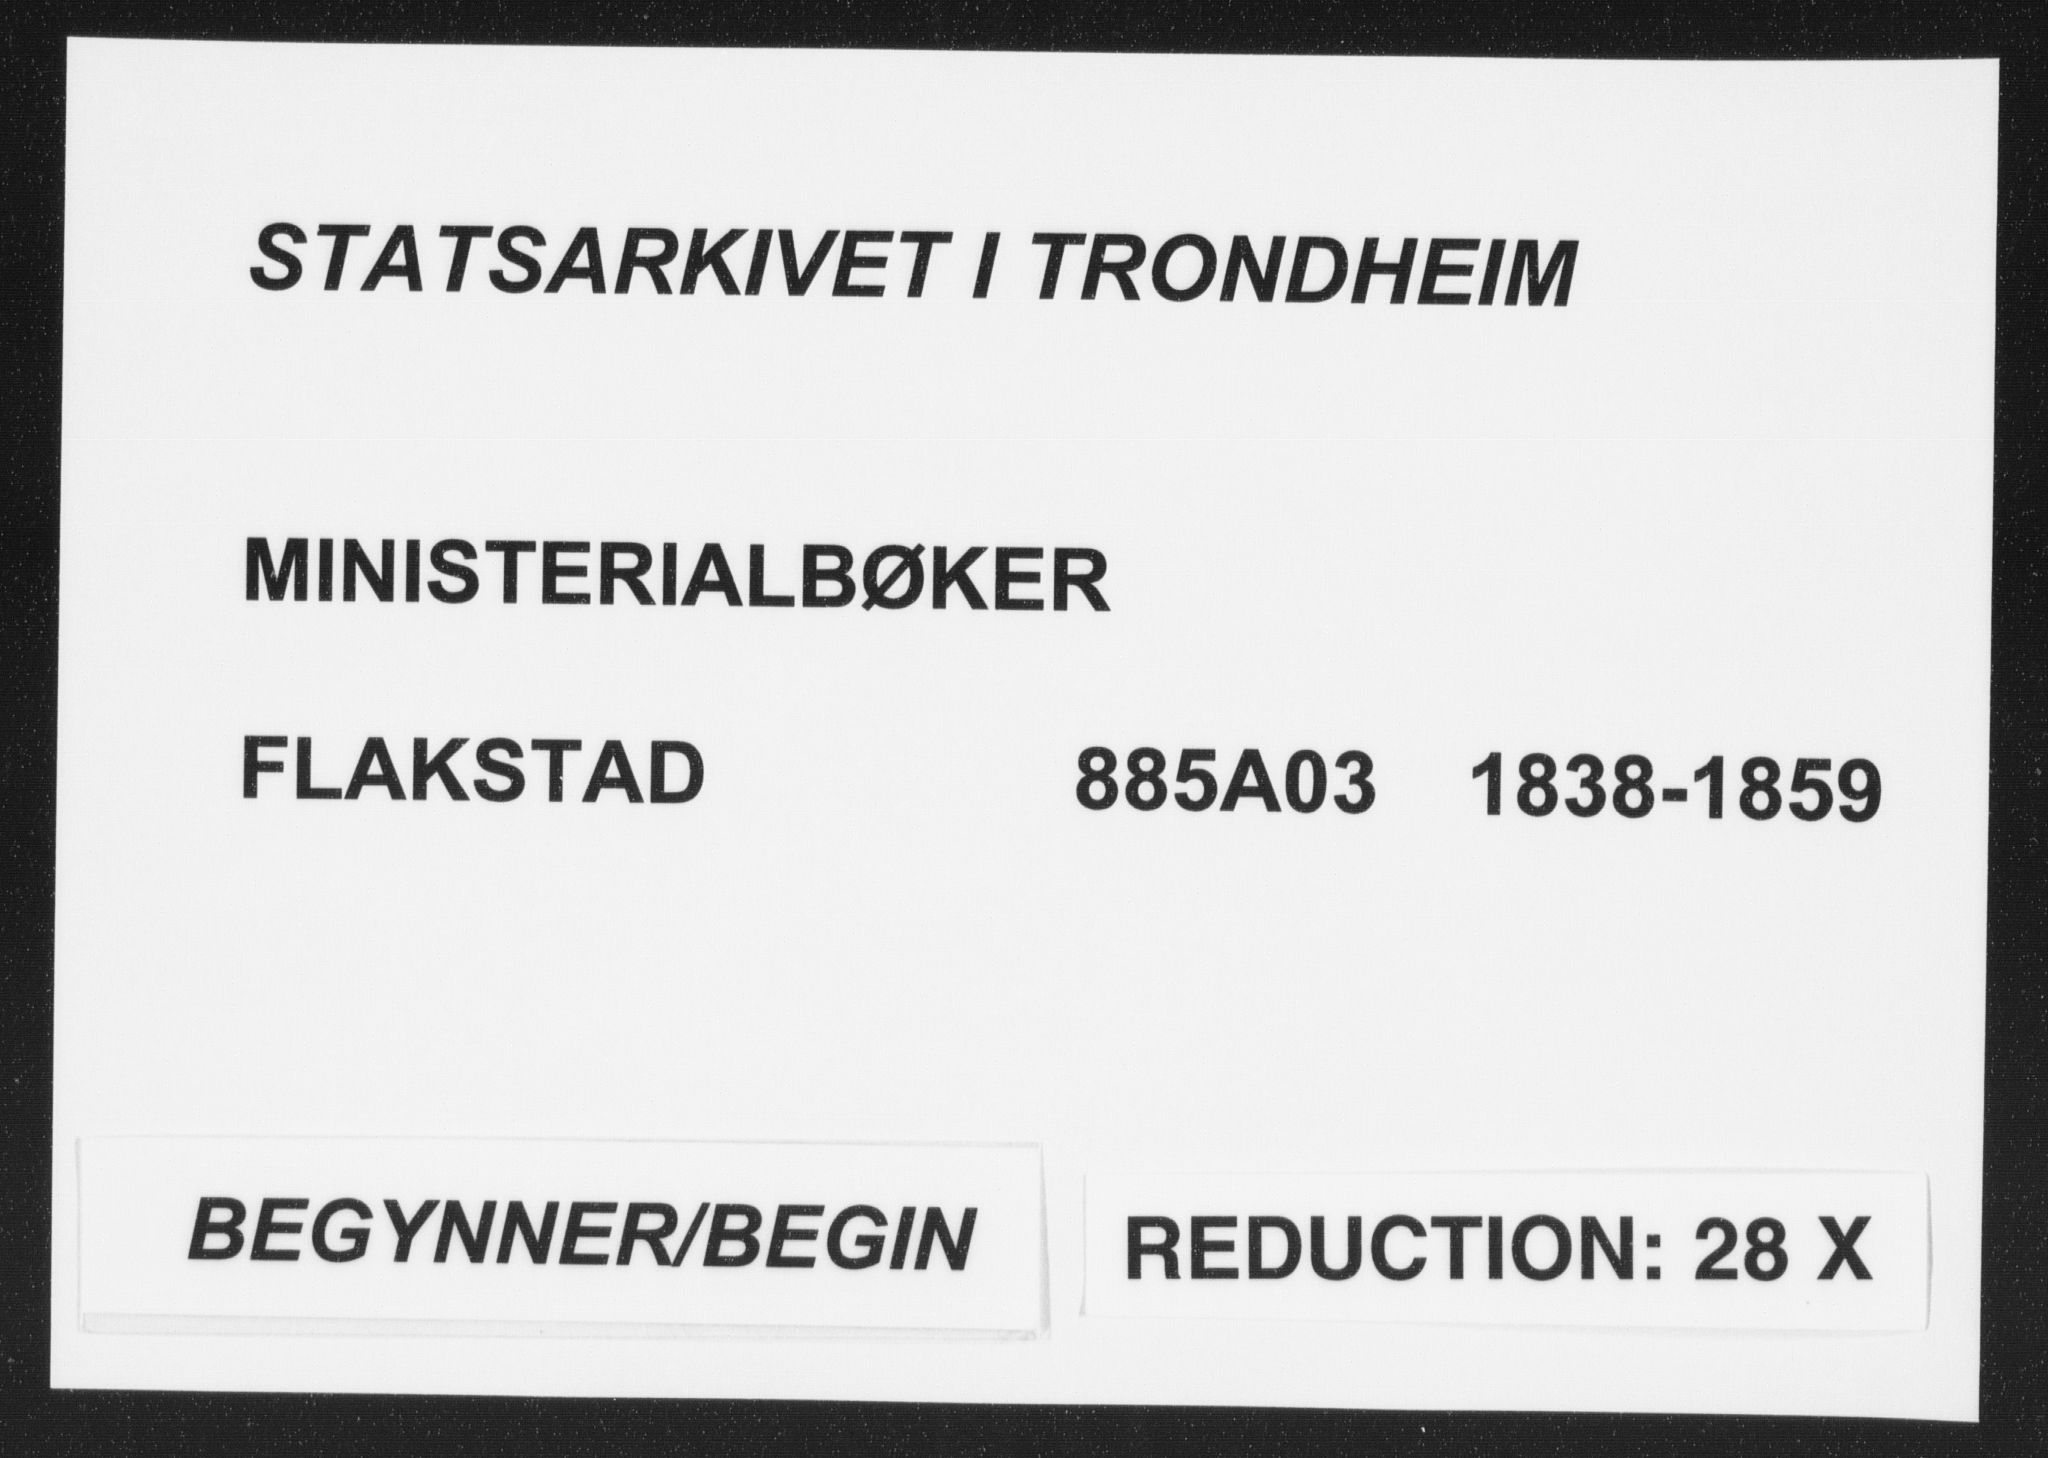 SAT, Ministerialprotokoller, klokkerbøker og fødselsregistre - Nordland, 885/L1202: Ministerialbok nr. 885A03, 1838-1859